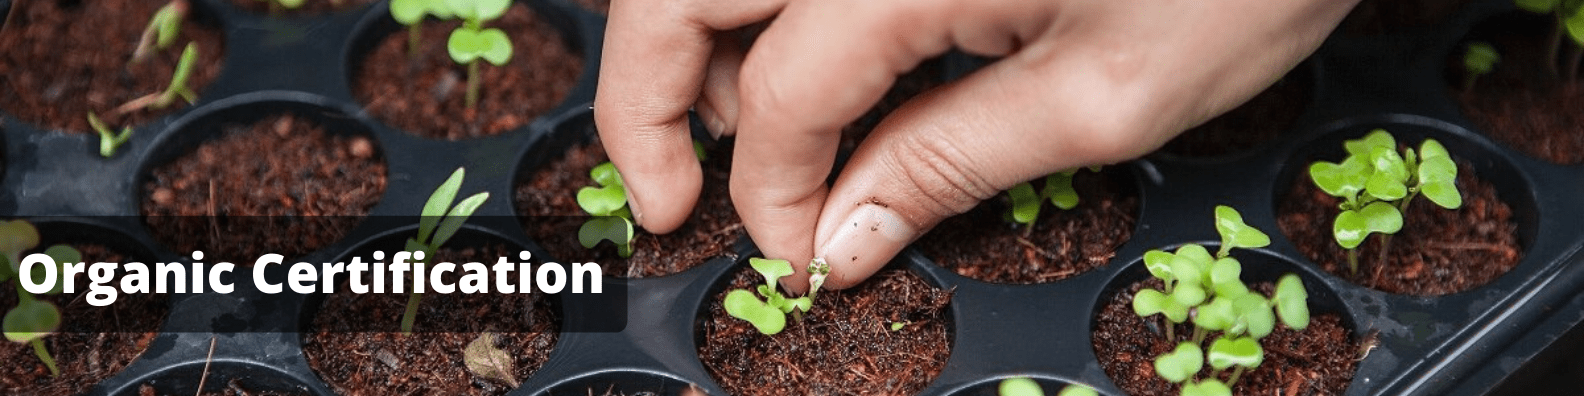 Organic Certification in Sri Lanka